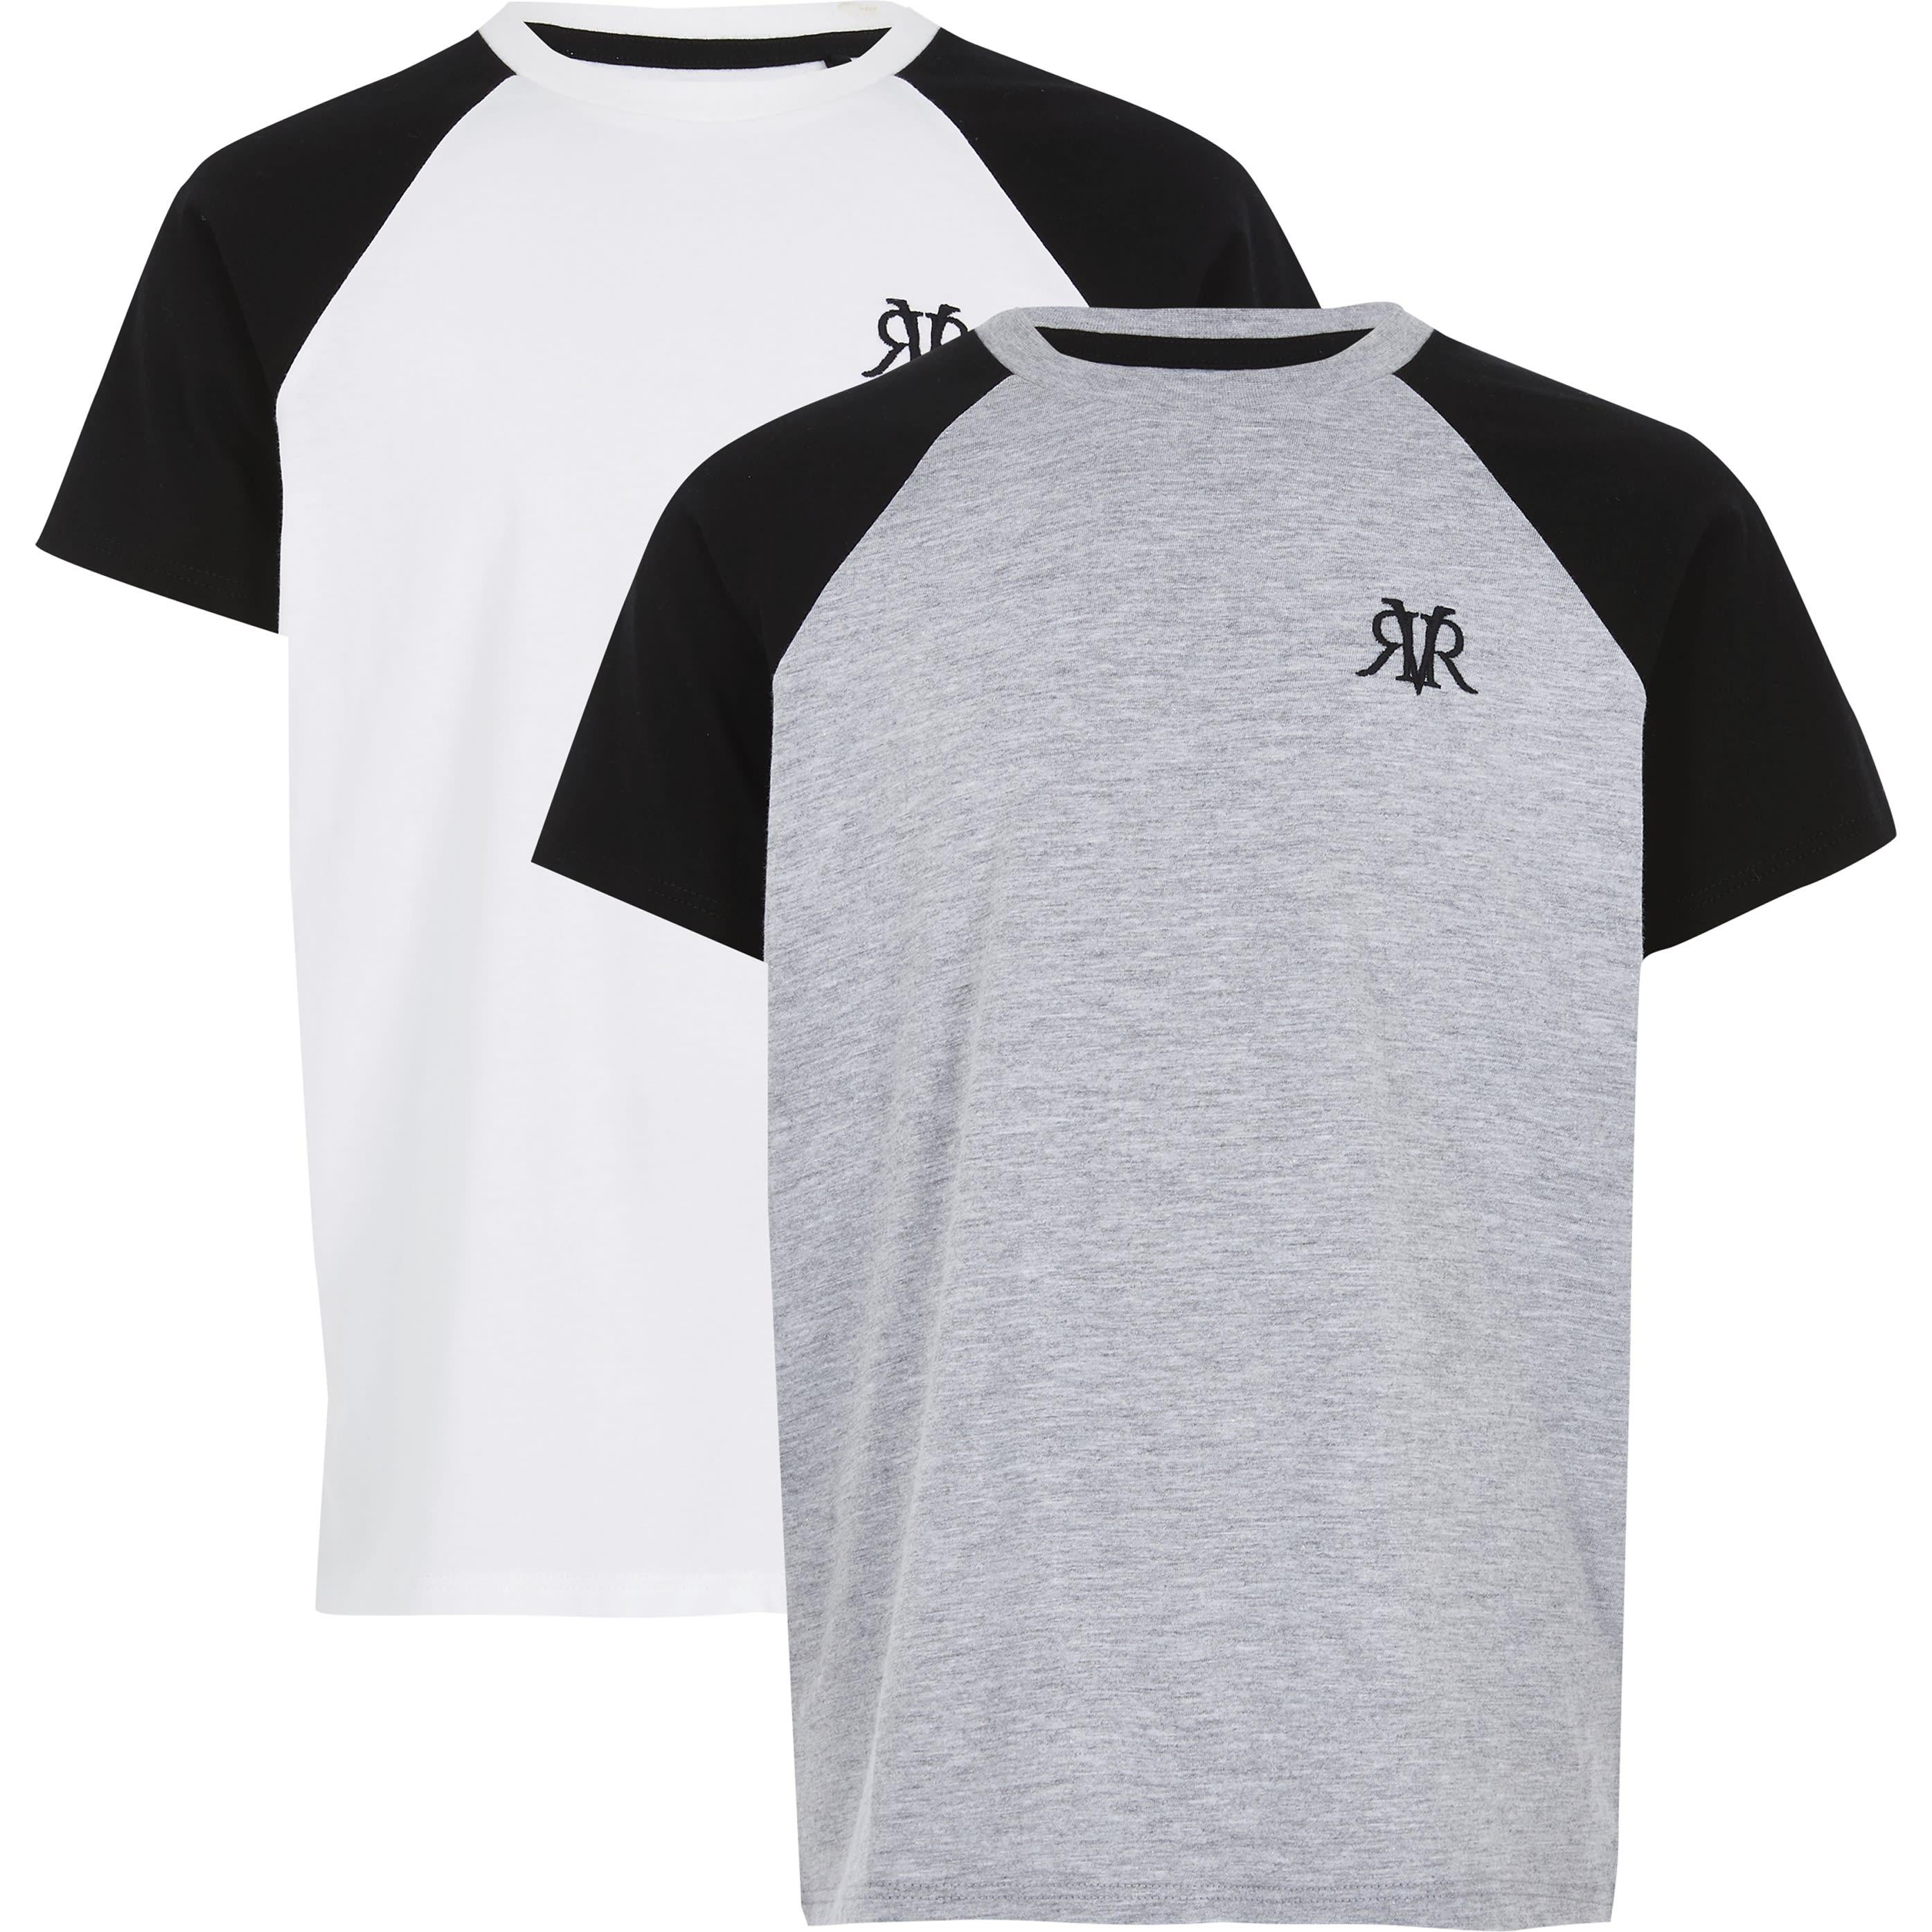 River Island Boys White RVR raglan T-shirt 2 pack (11-12 Yrs)